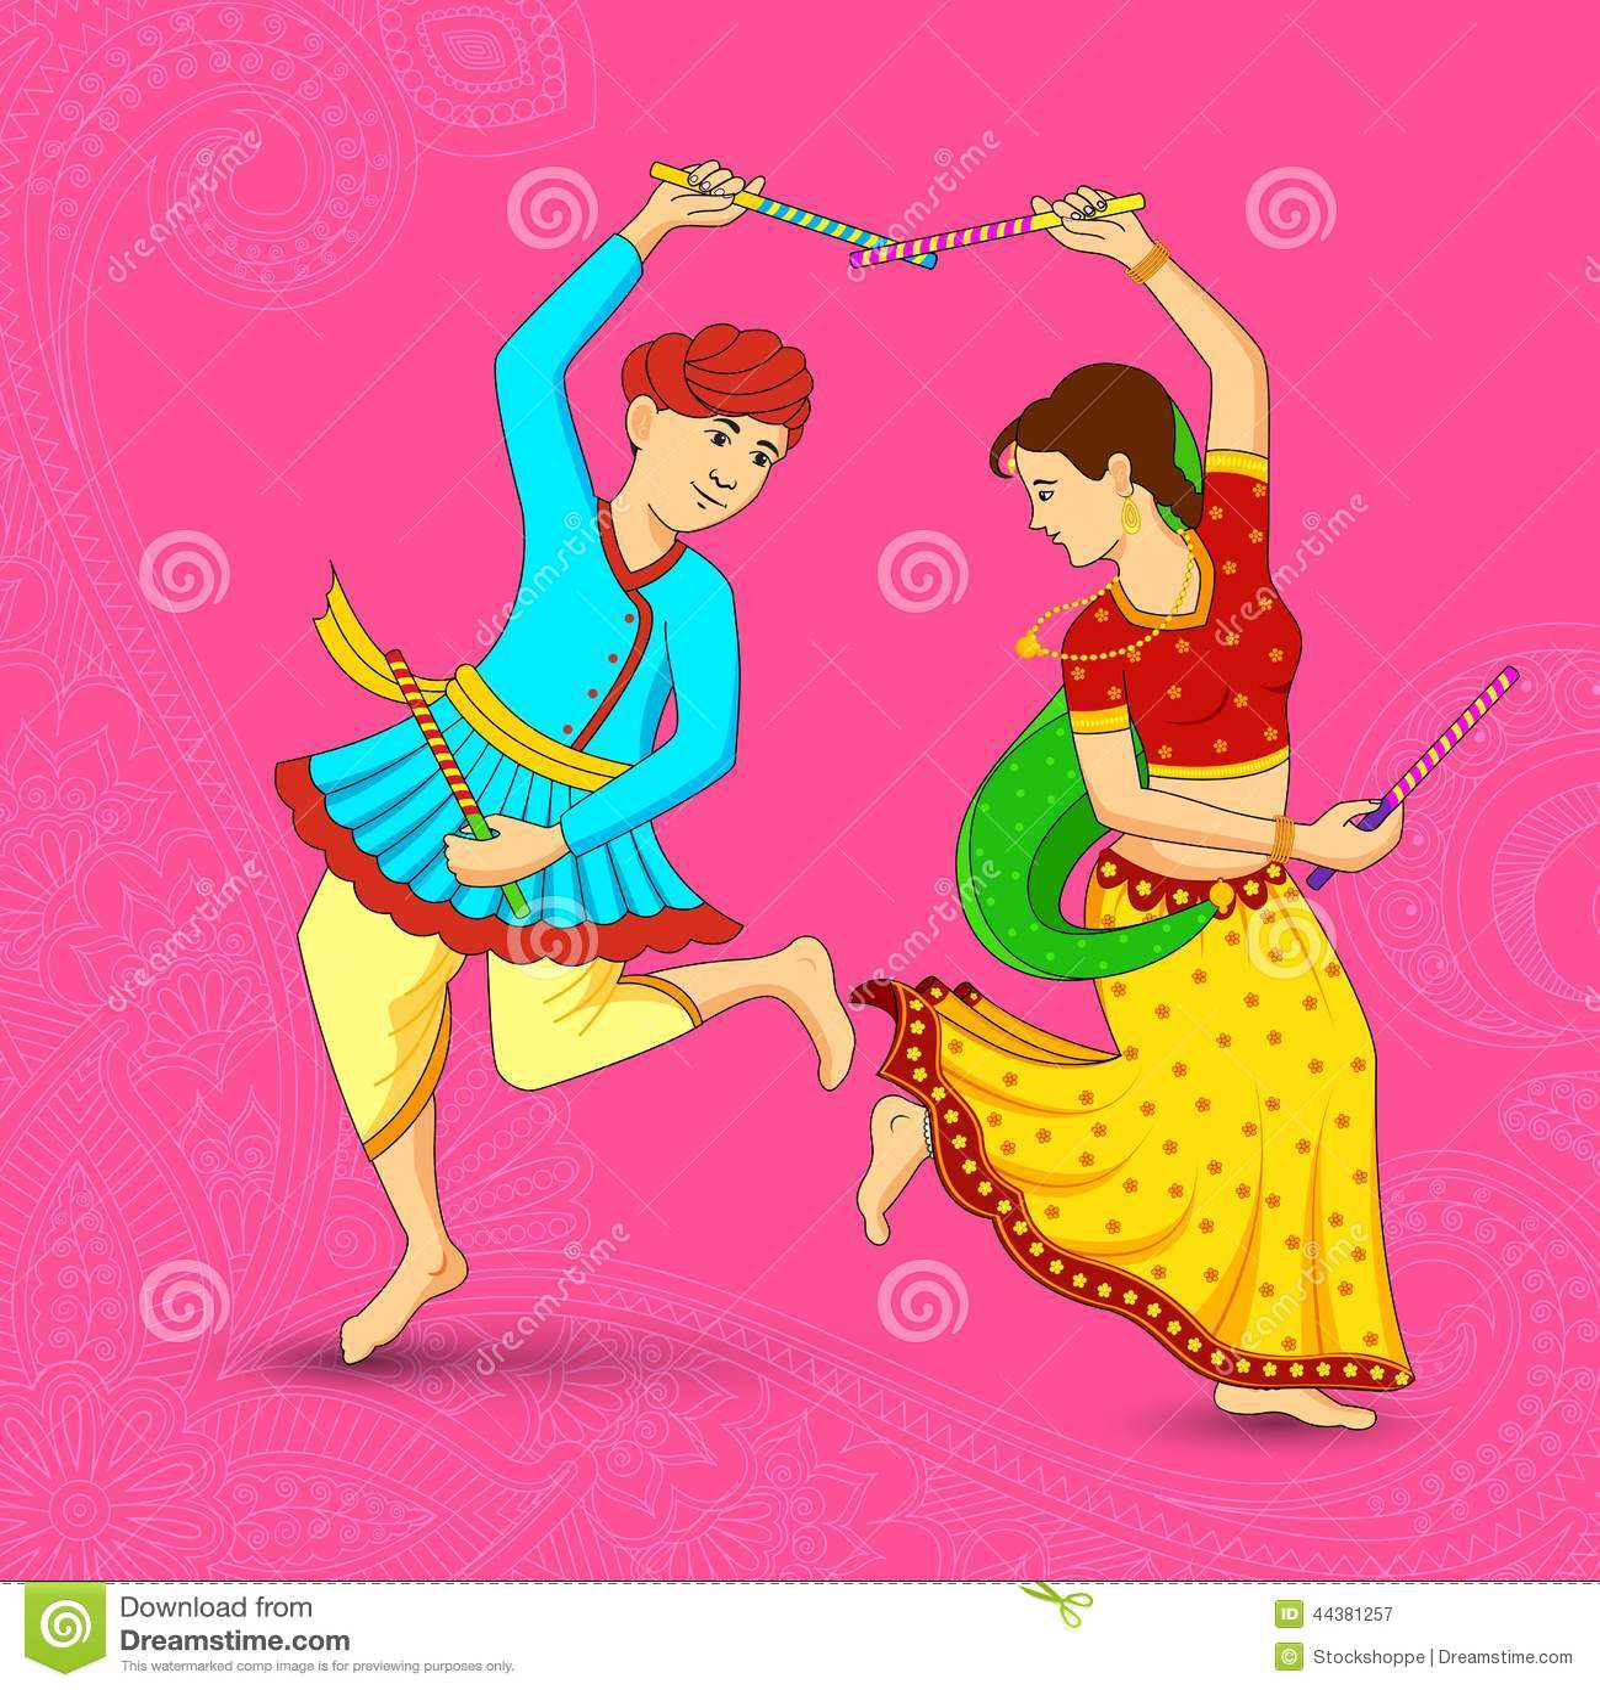 man and woman dancing on dandiya night stock vector